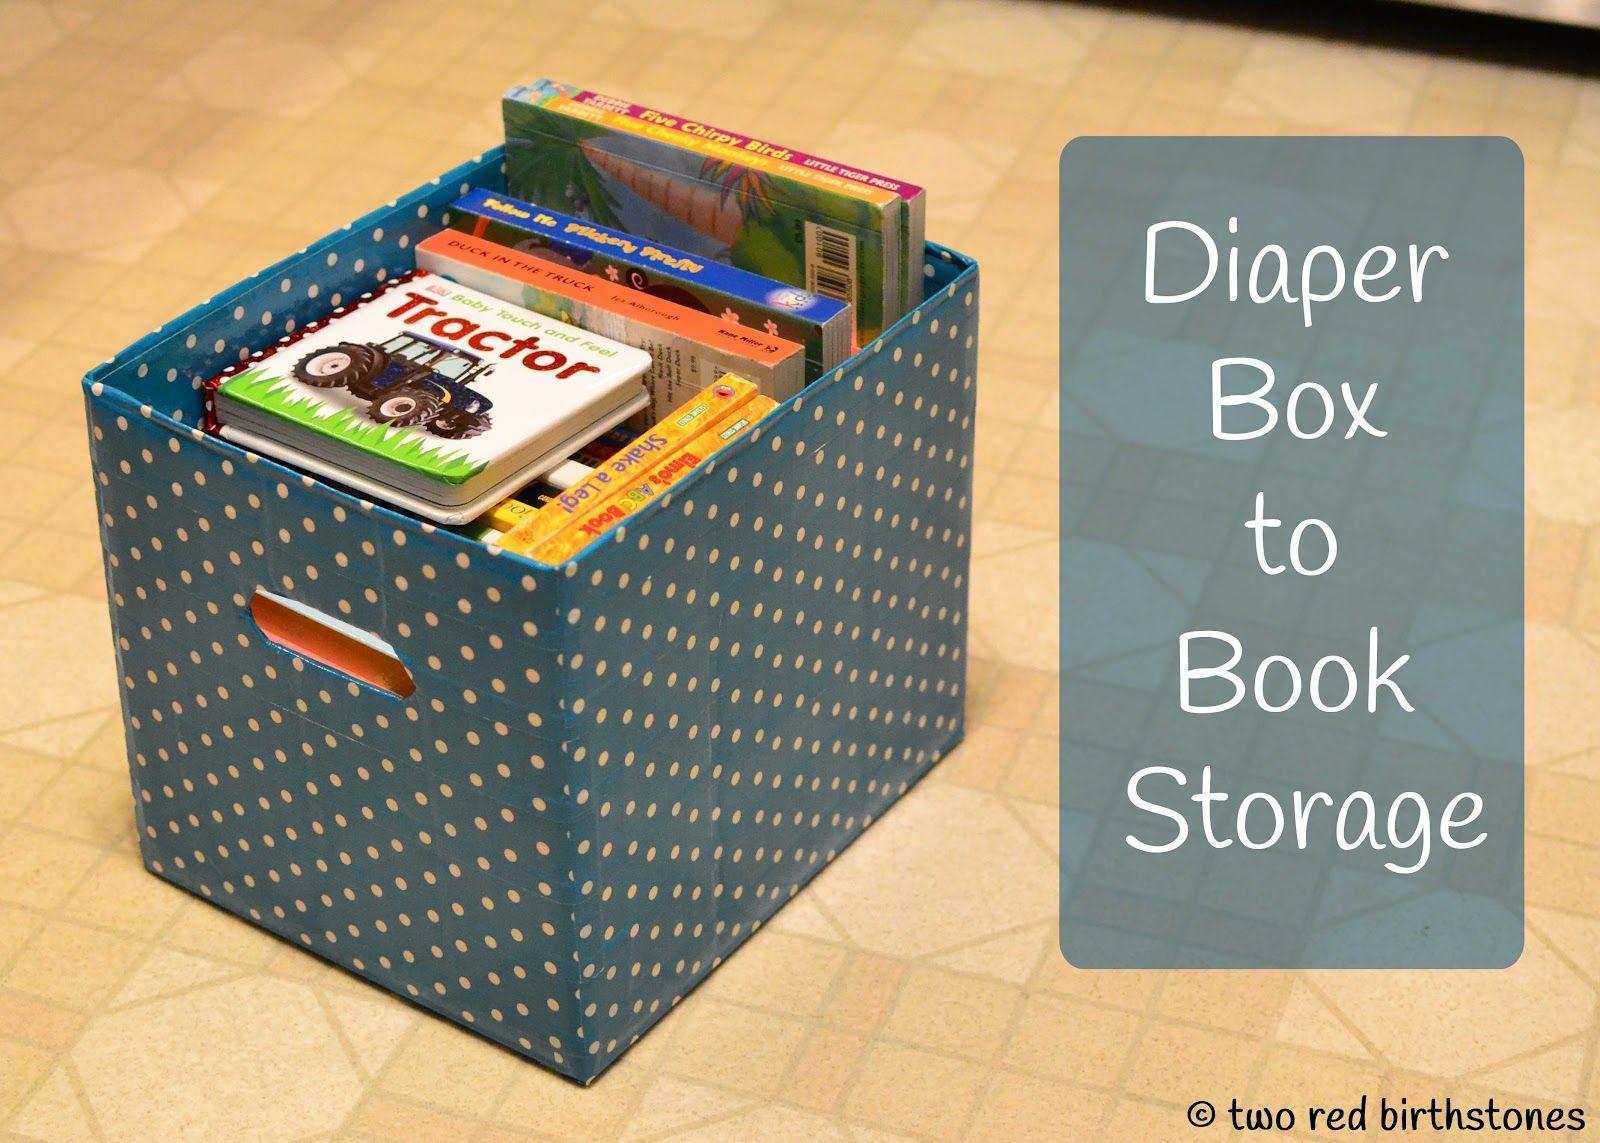 Diaper Boxes Storage Diaper Box To Cute Storage Box